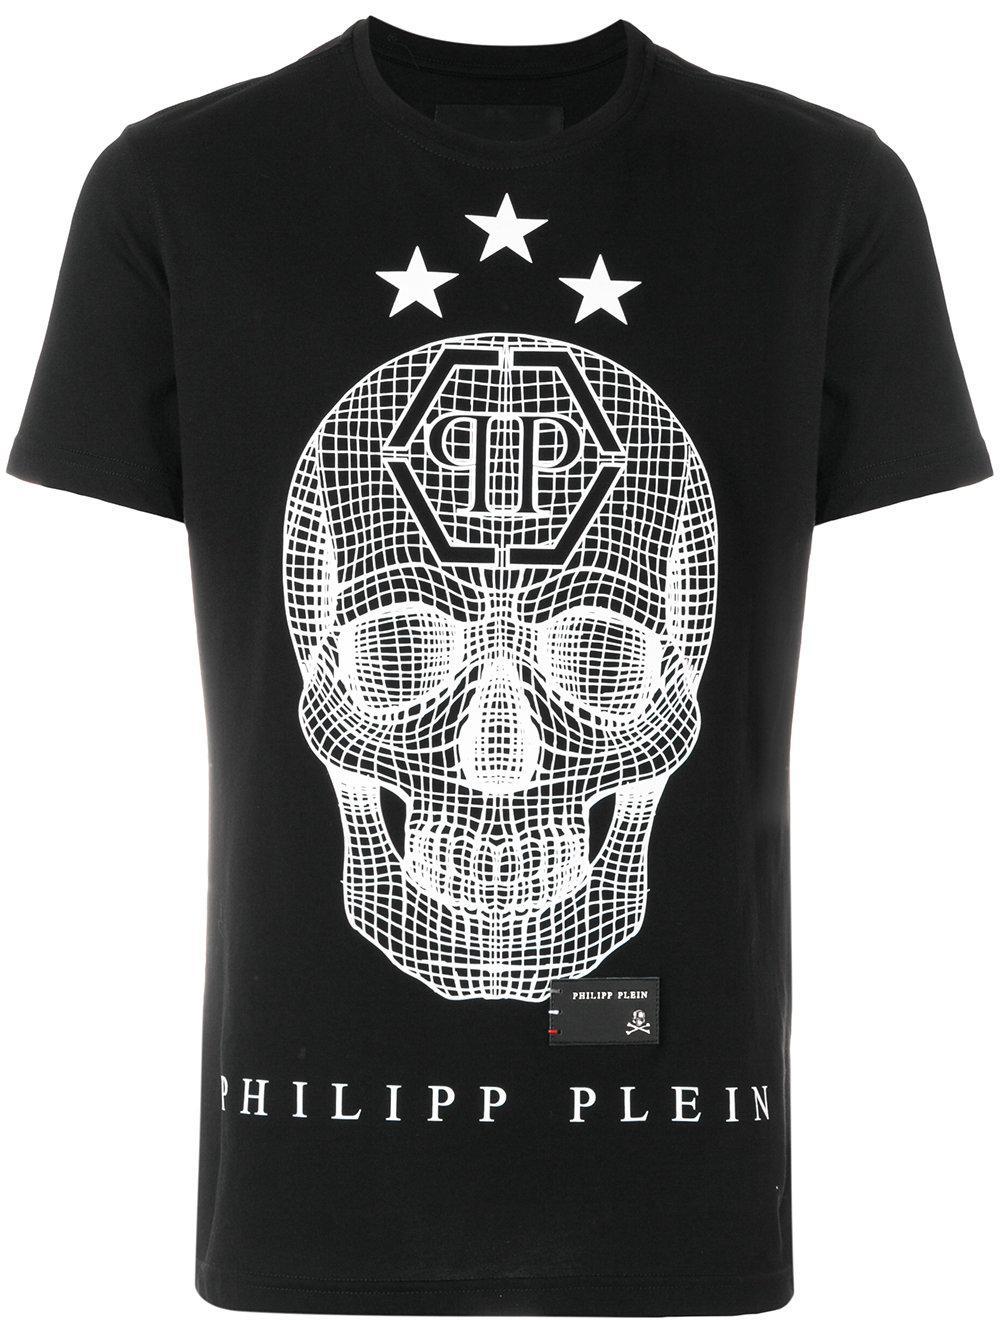 lyst philipp plein say something t shirt in black for men. Black Bedroom Furniture Sets. Home Design Ideas